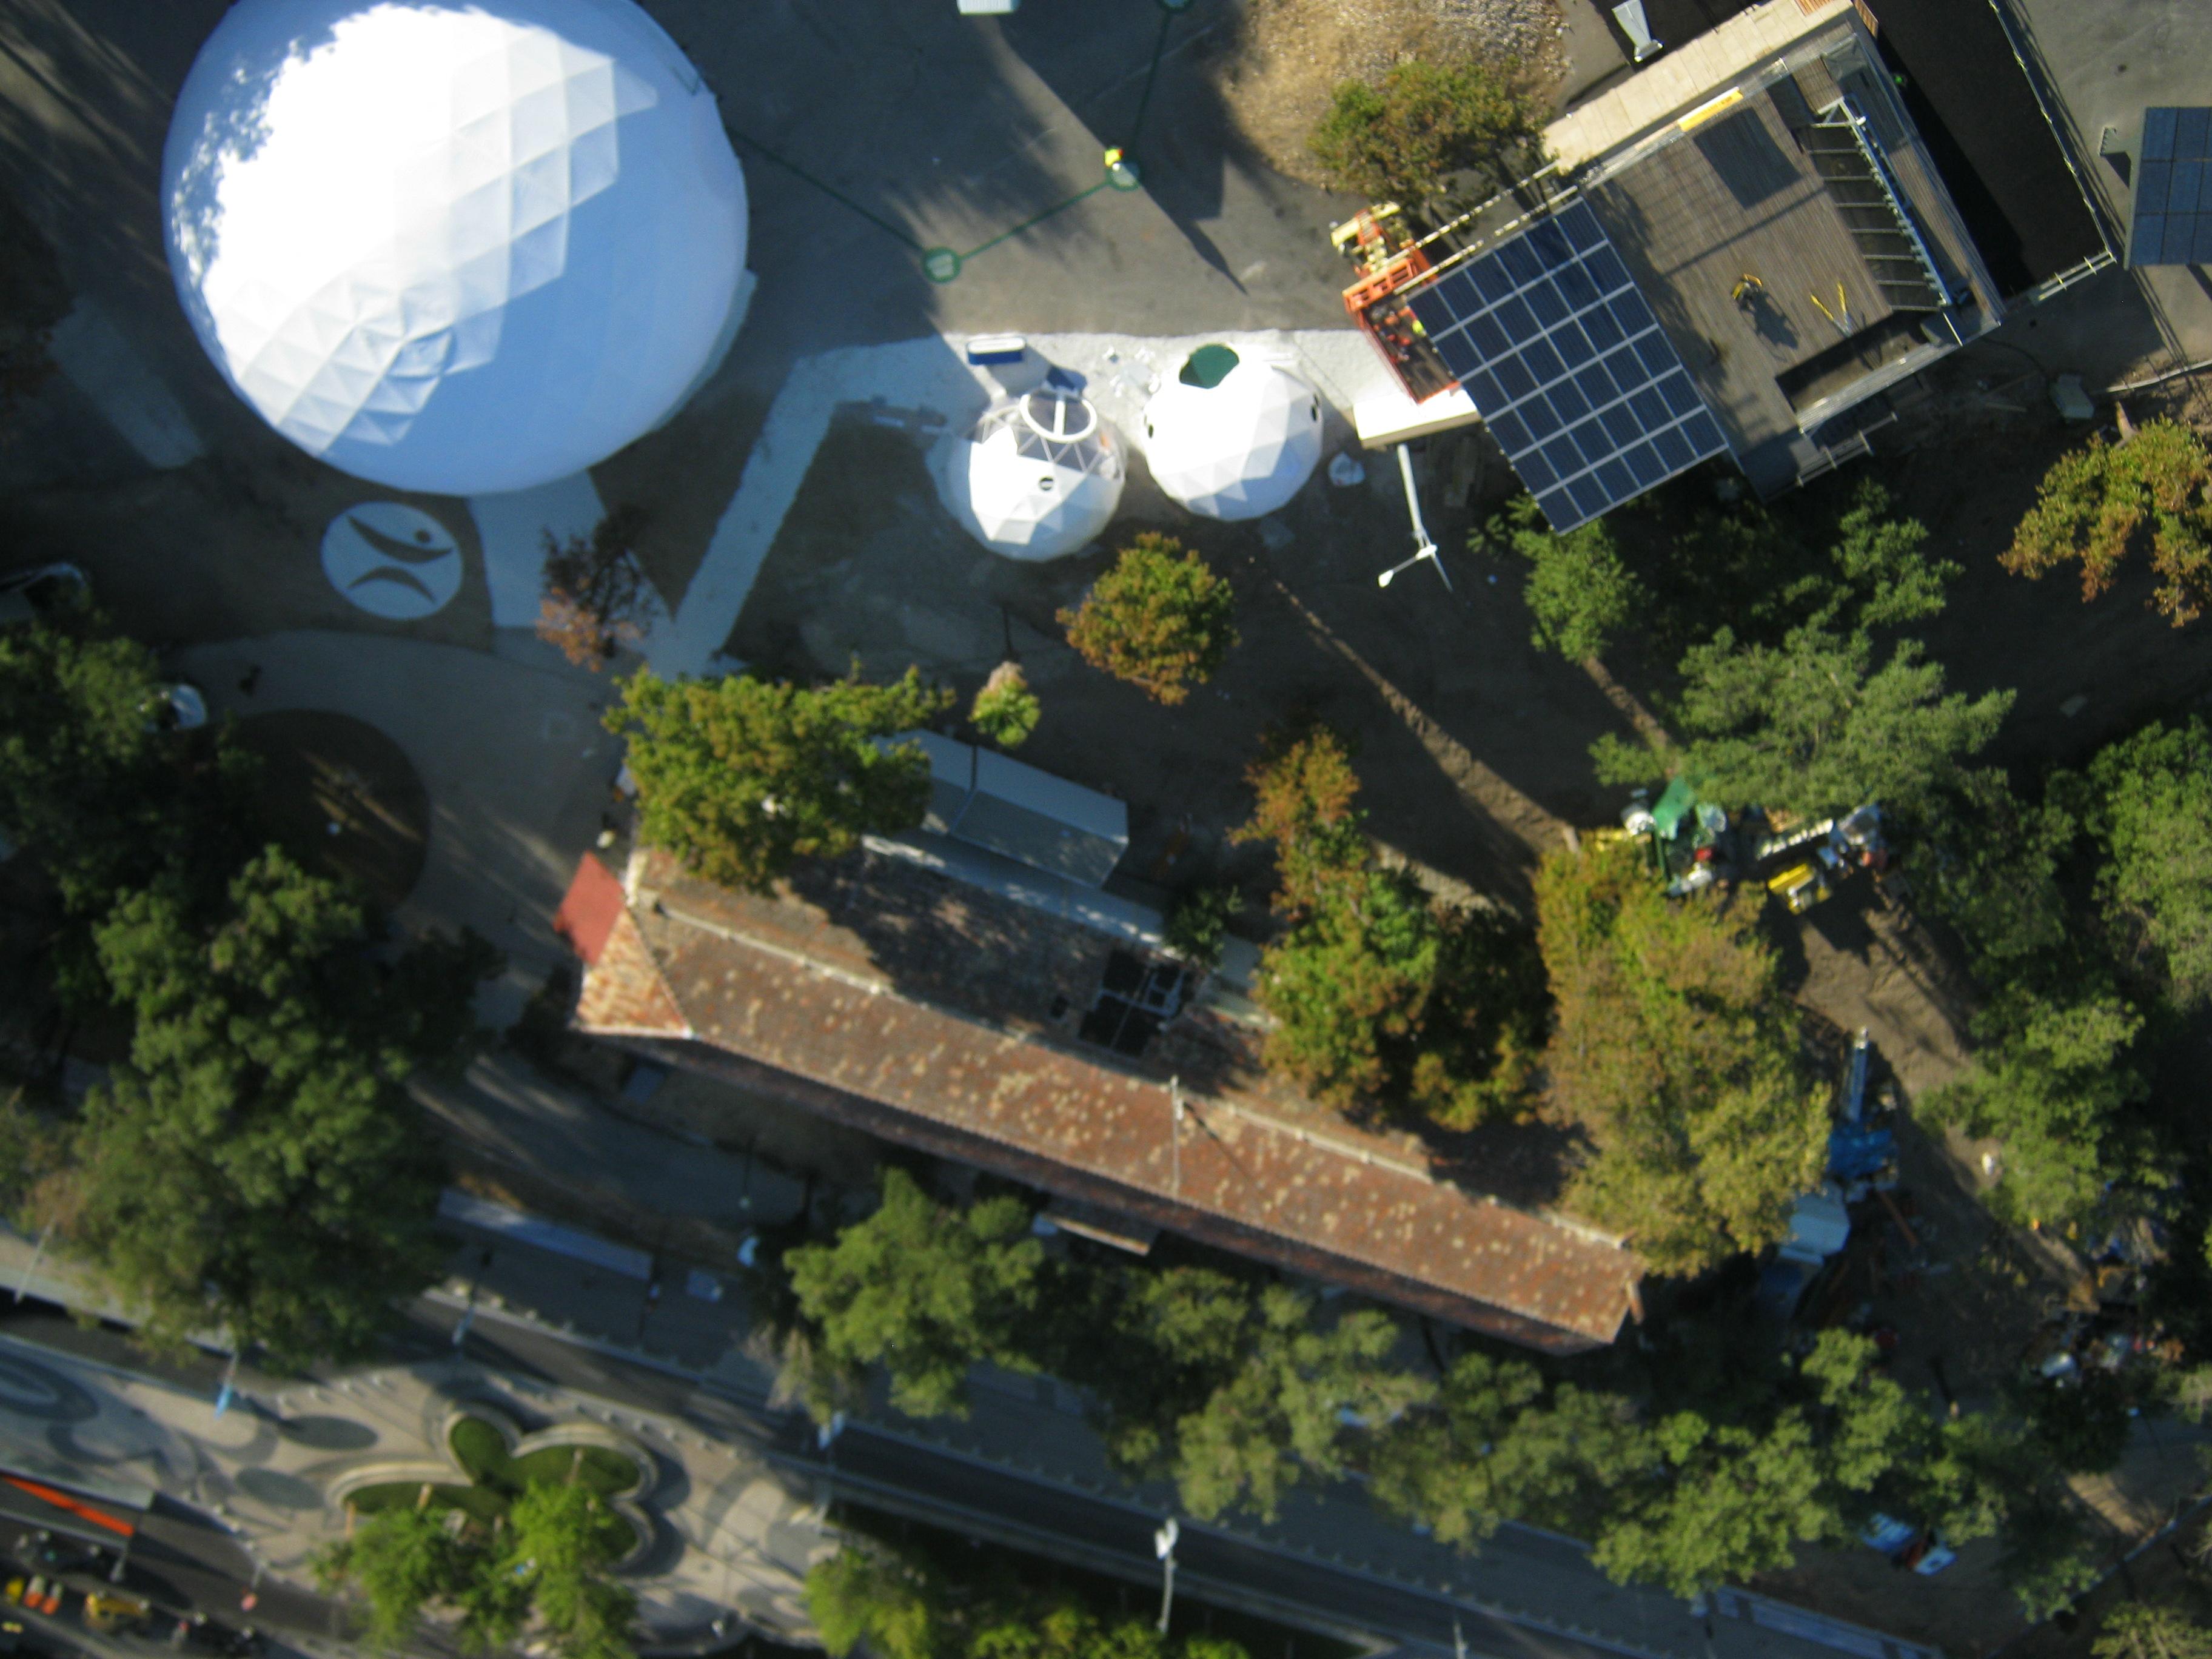 solar-decathlon-2012--madrid